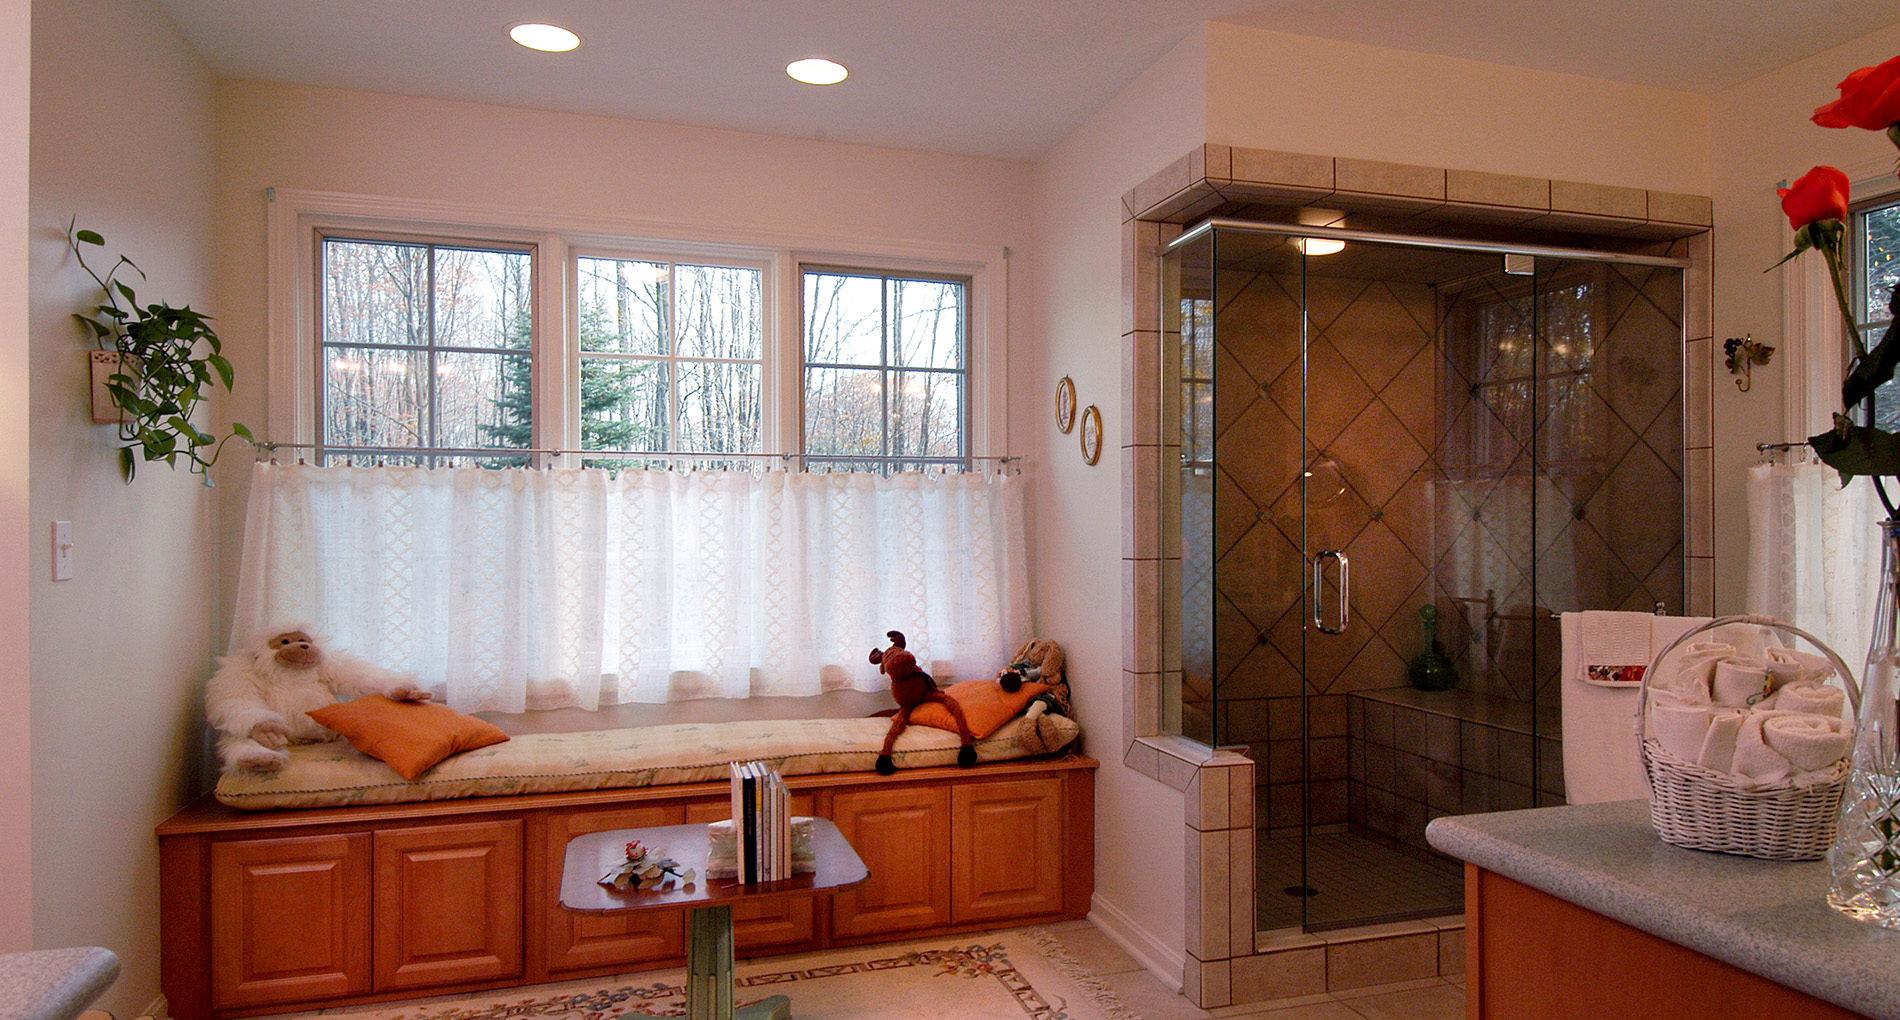 Bathroom Remodel Solon Gatesmills Slider